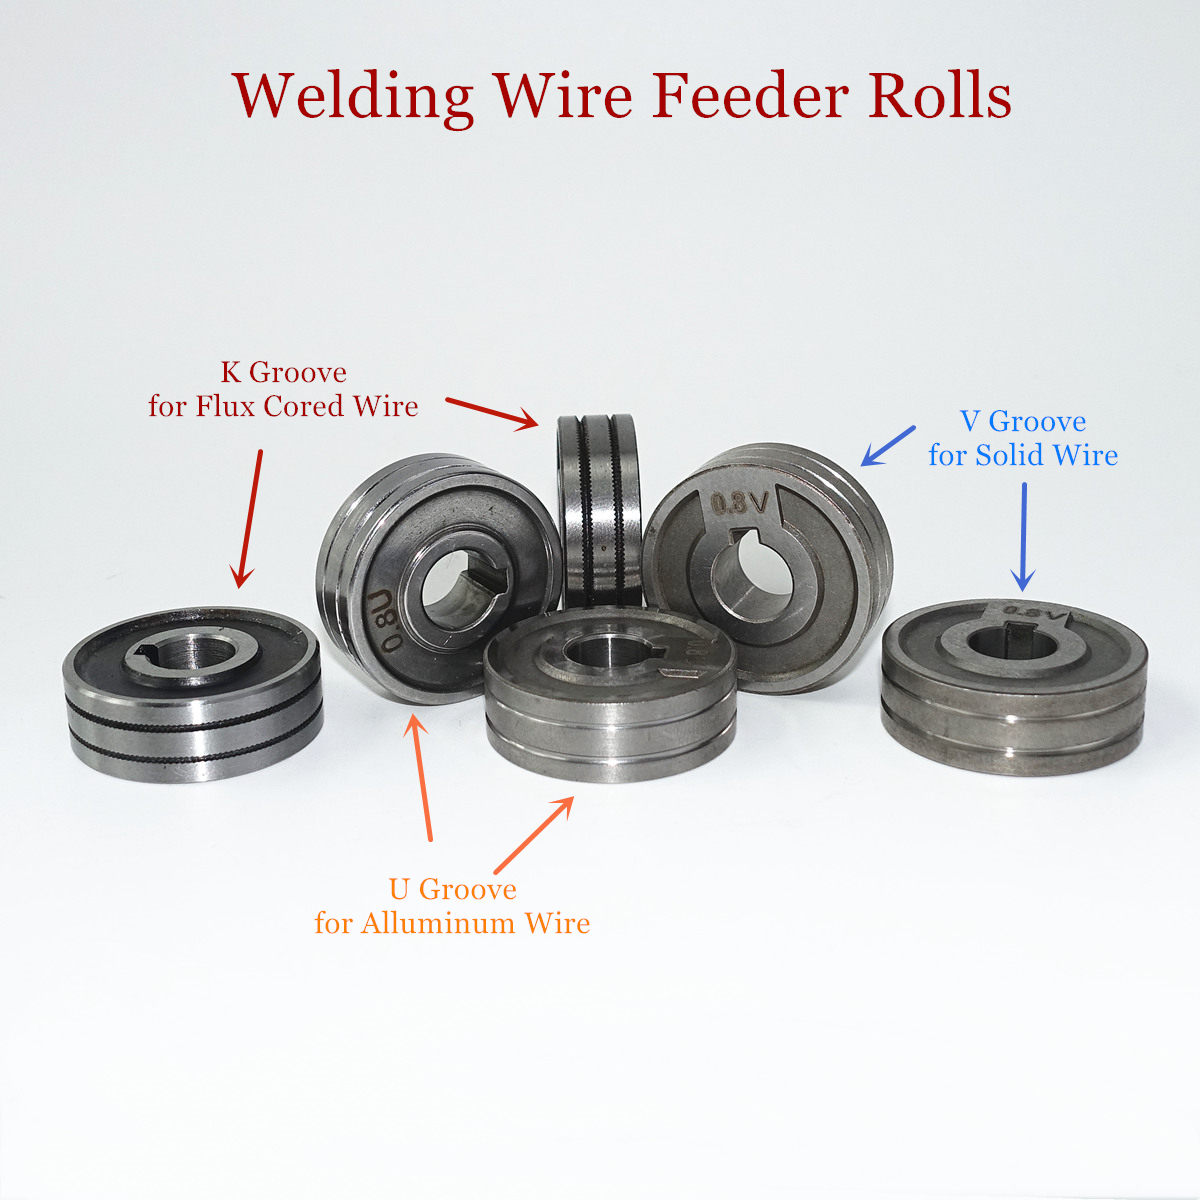 MIG Welding Wire Feeding Roll V U Knurl Groove 0.6mm 0.8mm 1.0mm Size 30x10x10mm LRS-775S SSJ-29 Wire Feeder Roll